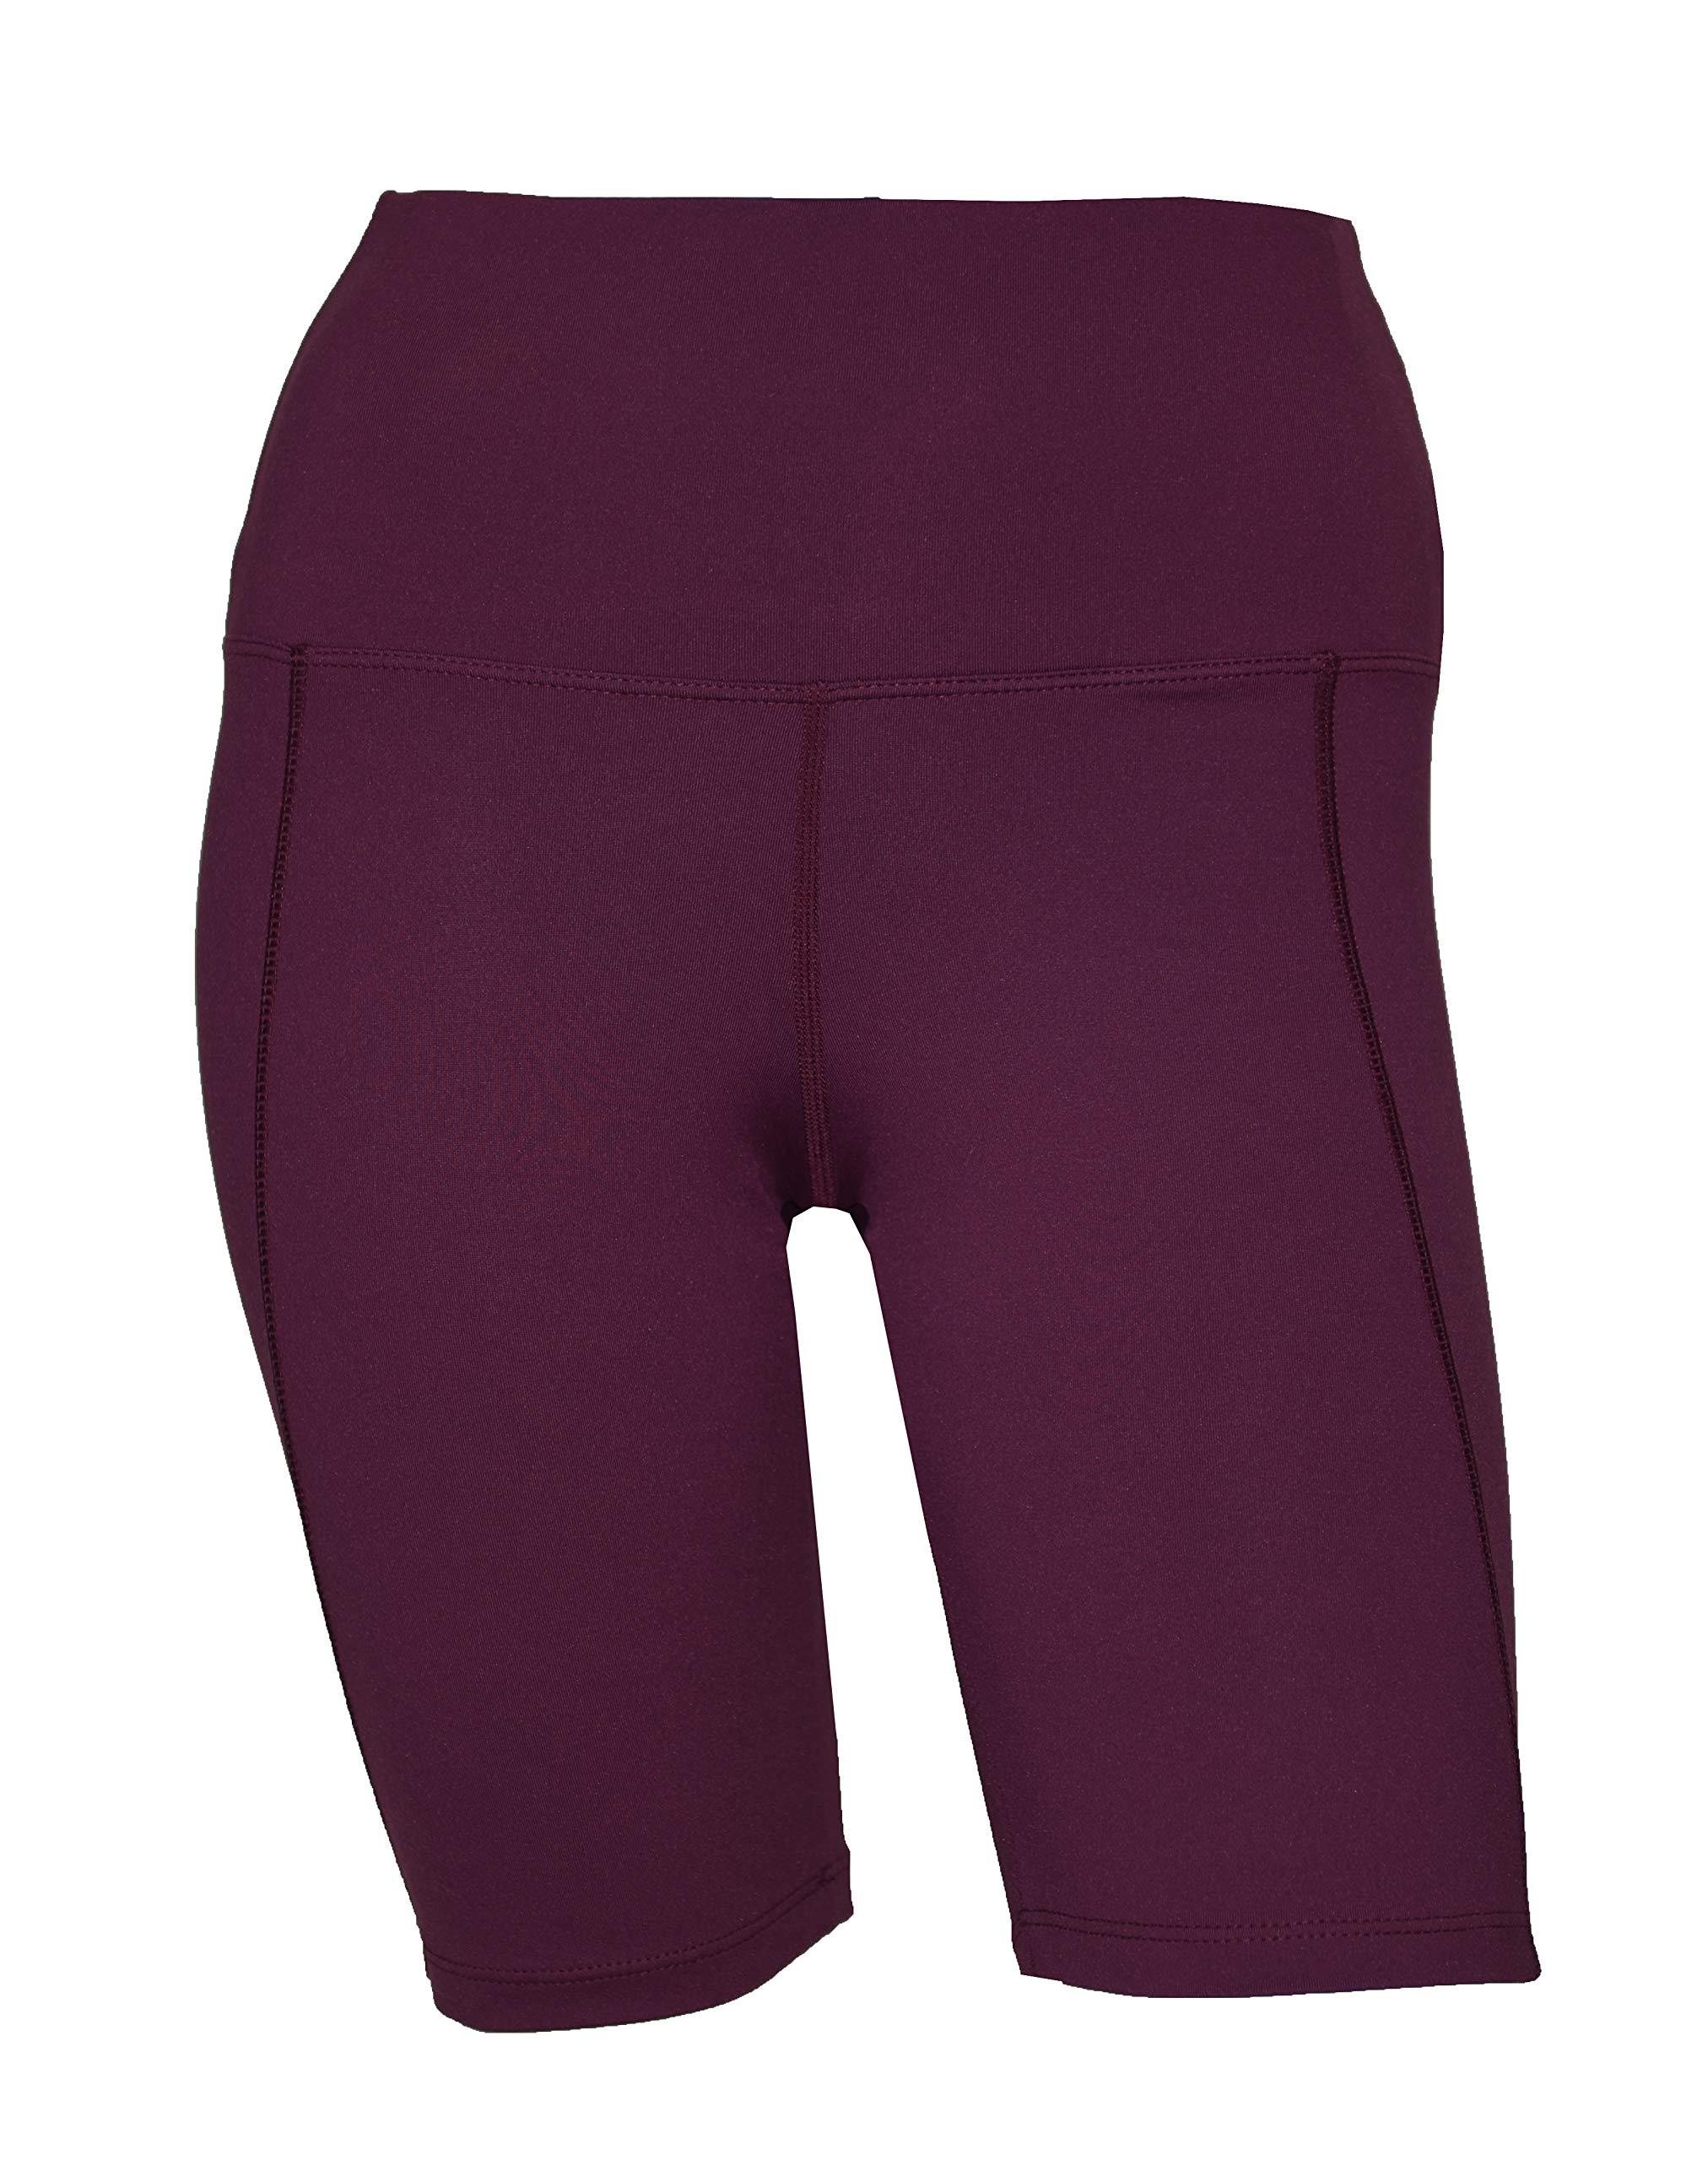 Private Island Women UV Swim Rash Guard Pocket Shorts Pants Yoga (XXXL, DWine) by Private Island